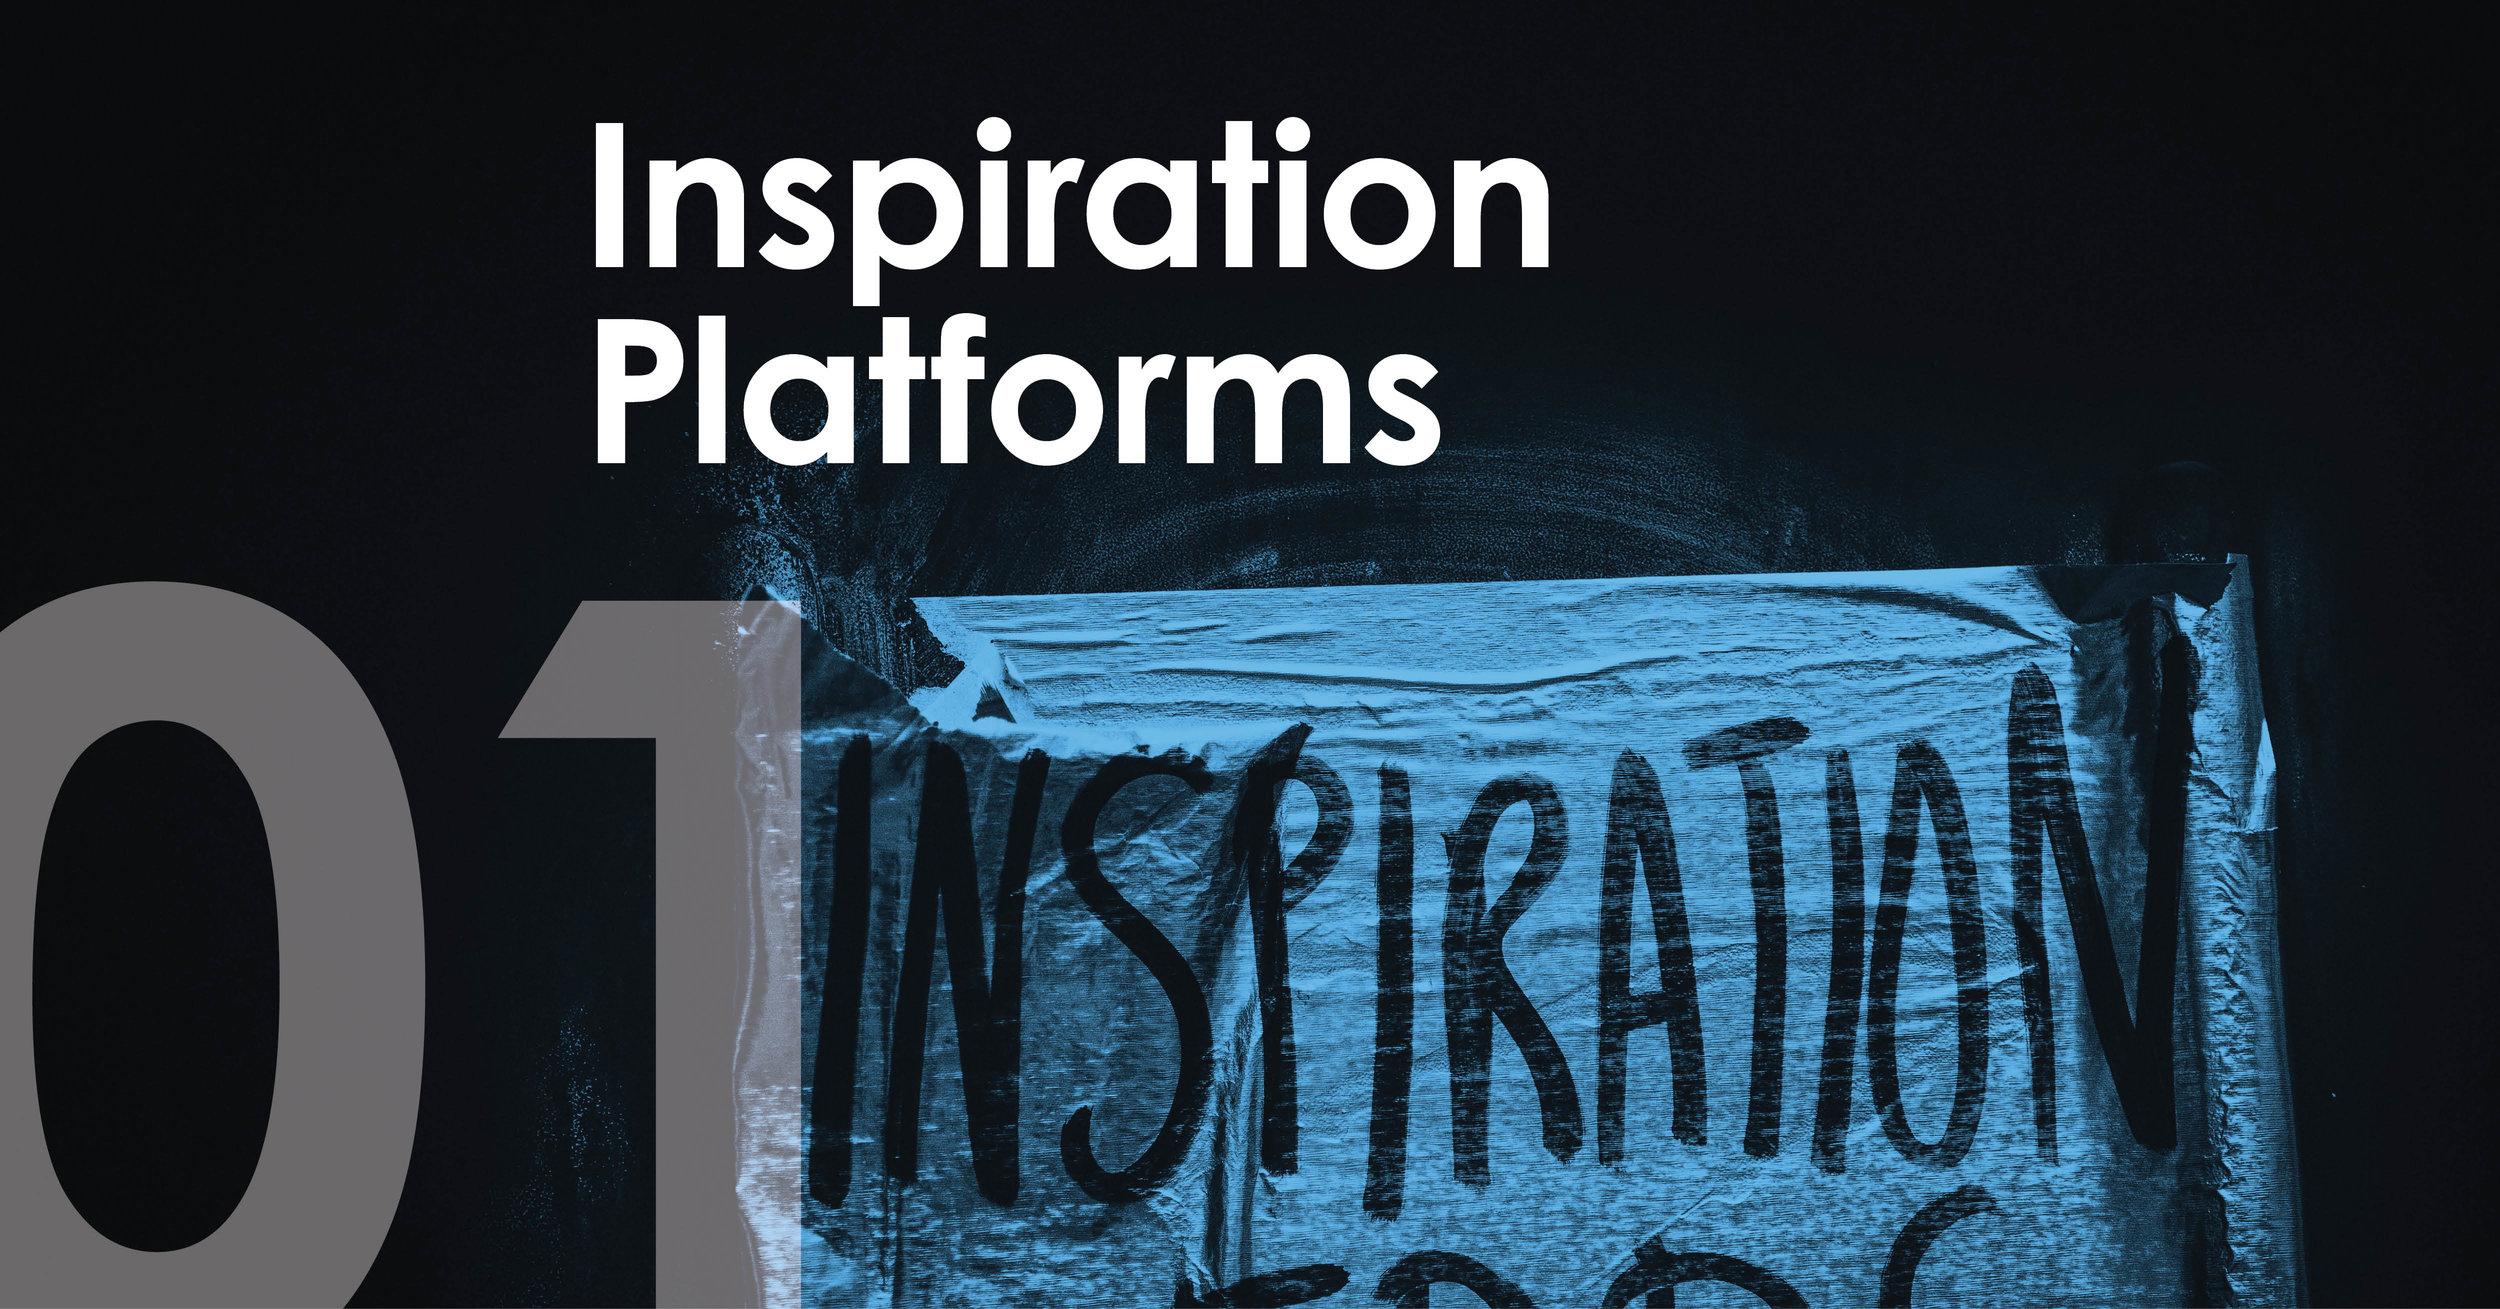 01. Inspiration platforms